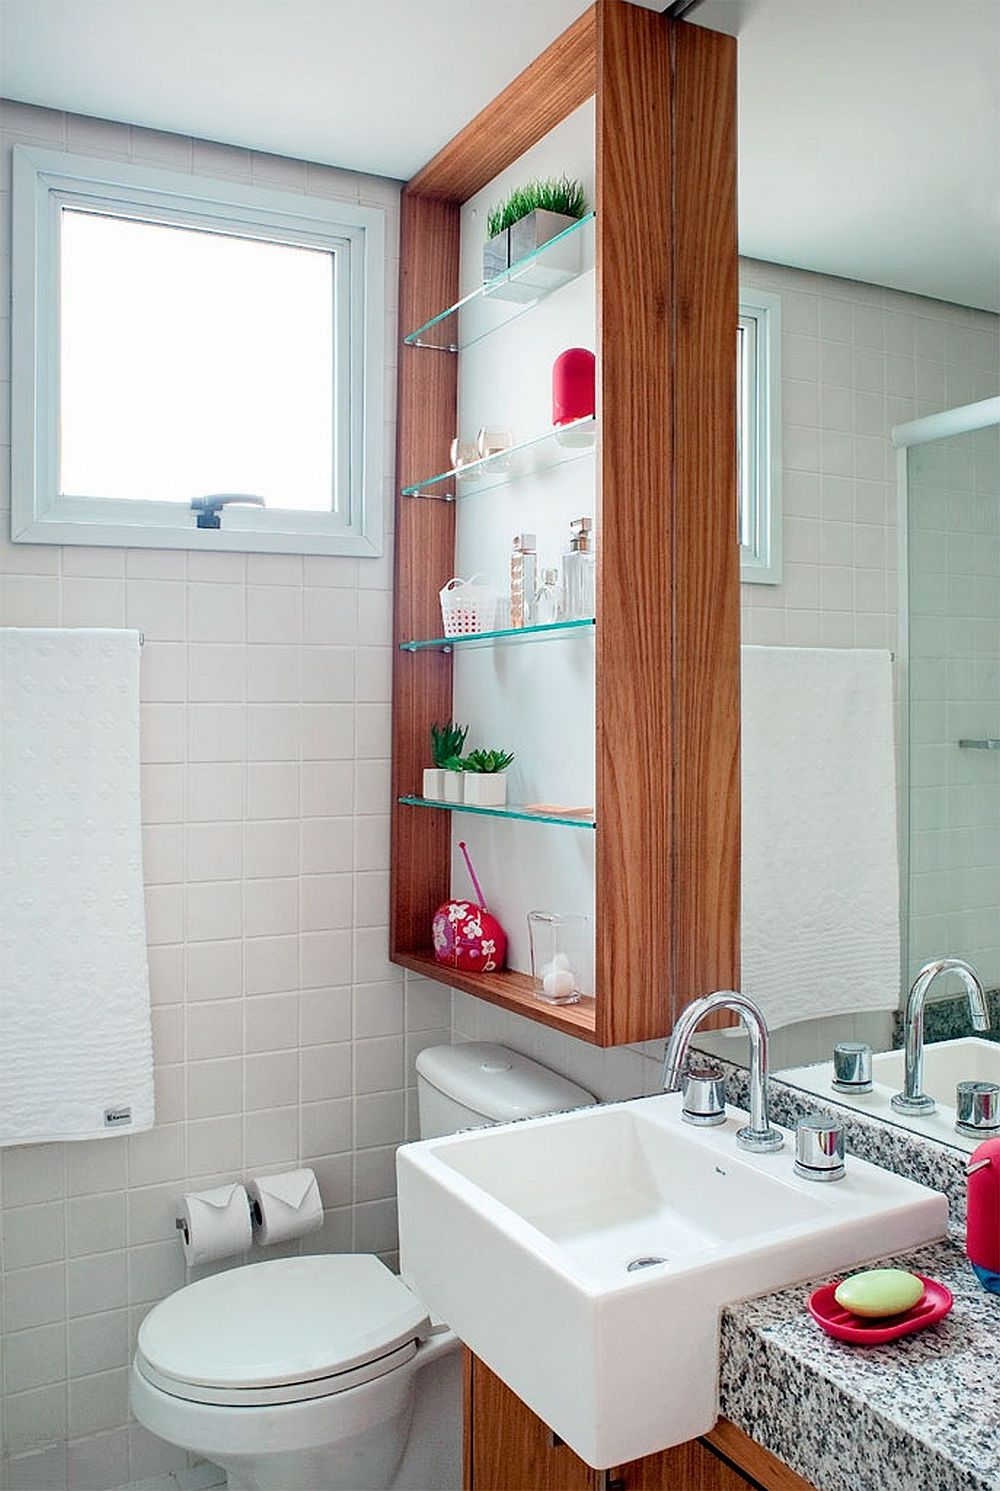 adelaparvu.com despre apartament de trei camere cu gratar pe balcon, designer Daniela Berardinelli (11)